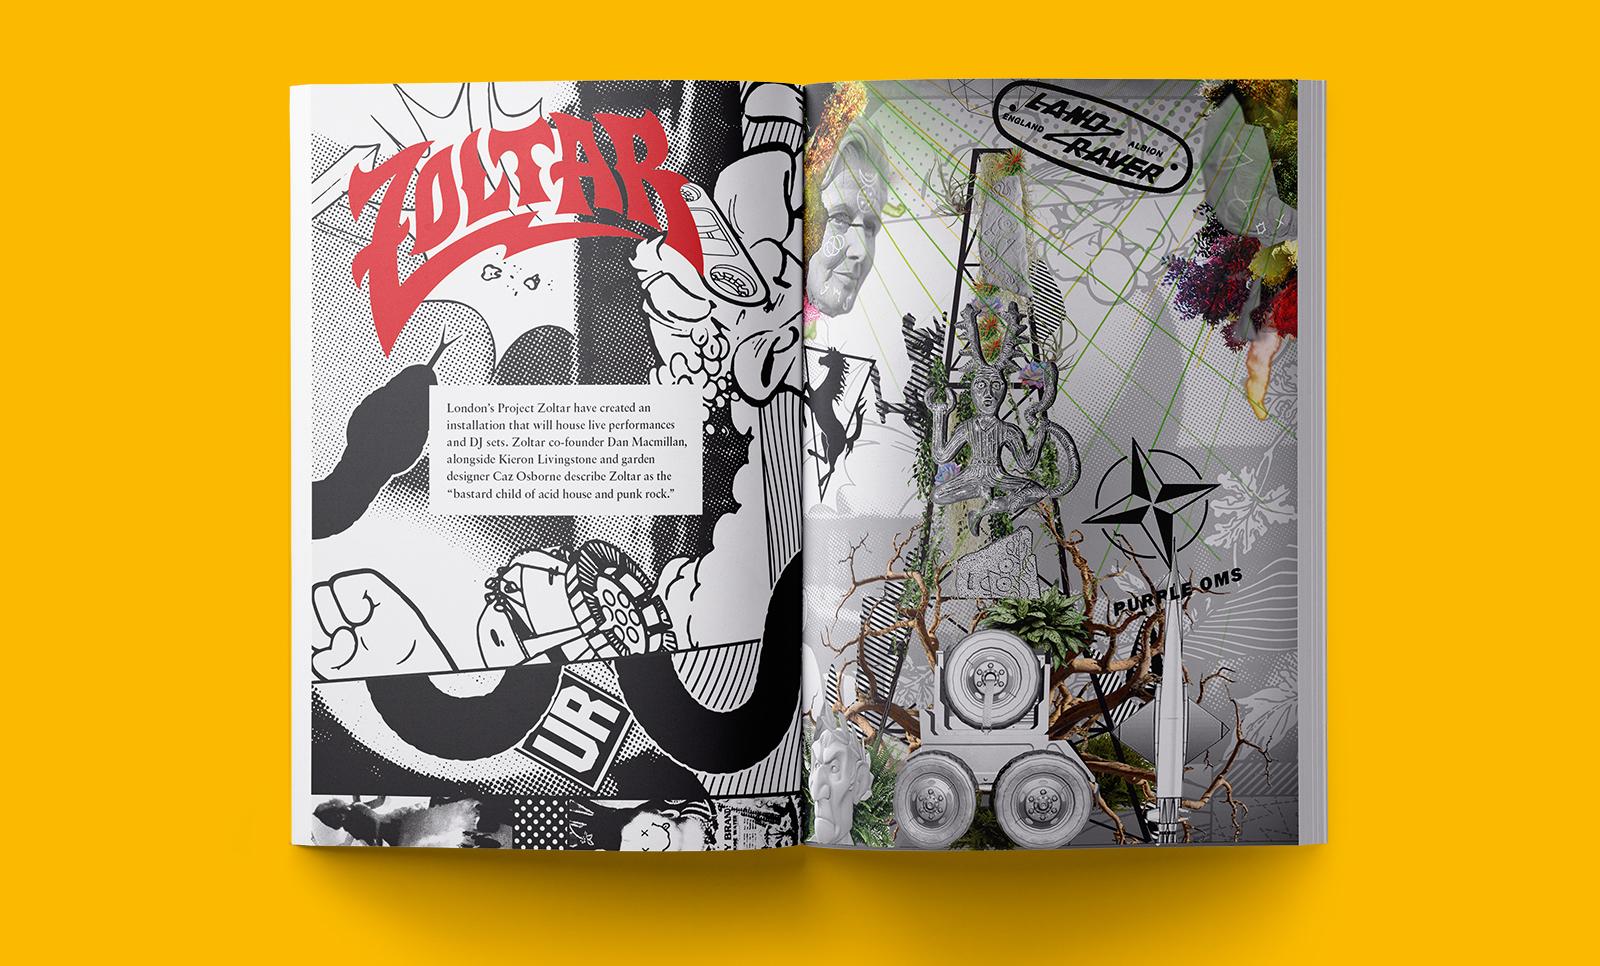 Sweet-Harmony-Saatchi-Gallery-Rave-Today-Book-Zoltar-Pavement-Licker.jpg